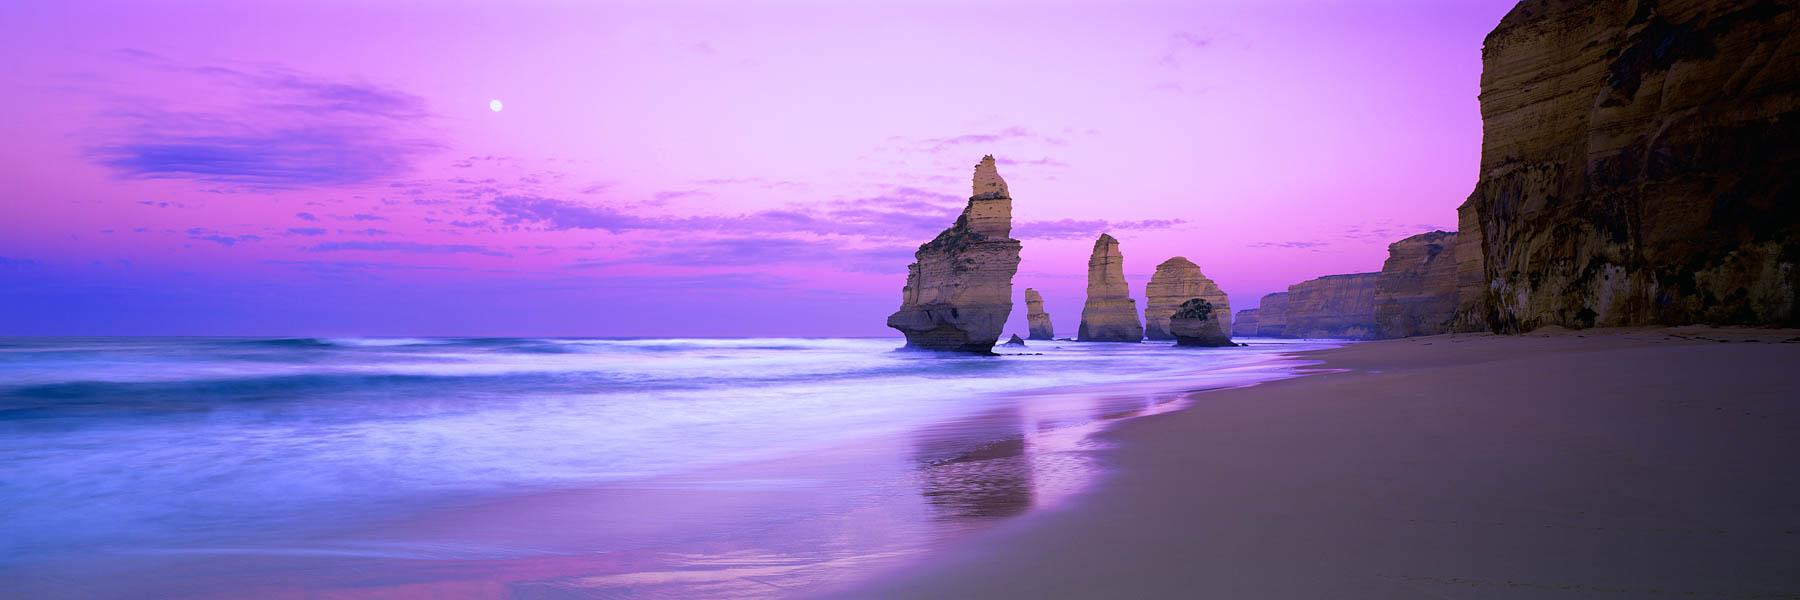 A full moon setting into a pastel sunrise over The Twelve Apostles, Victoria, Australia.